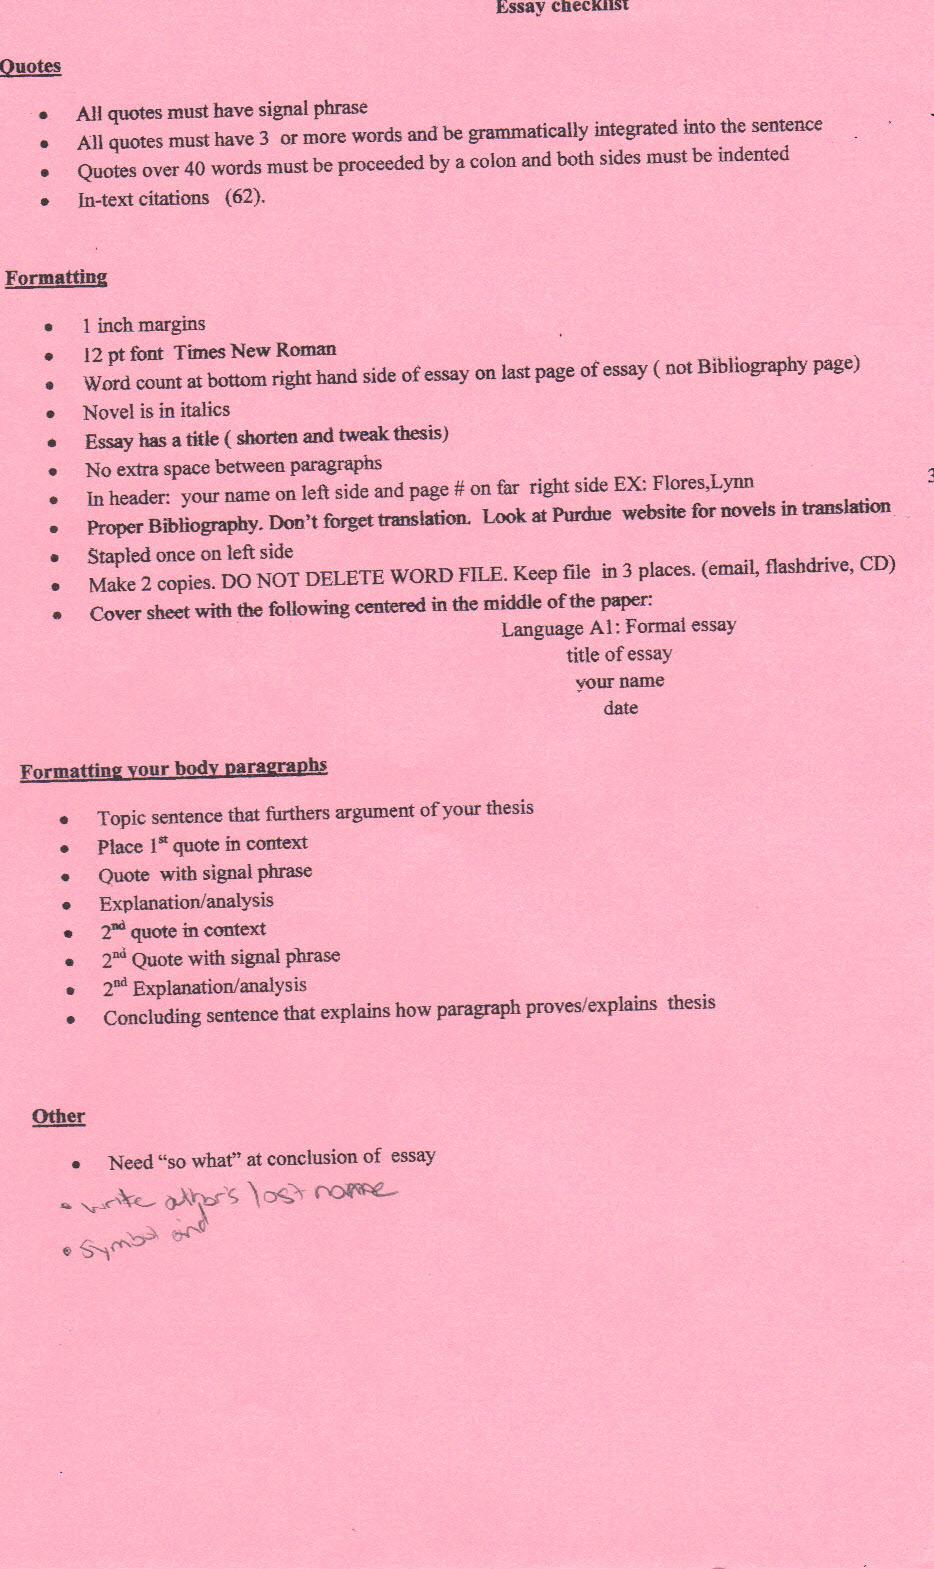 the sake essay on identity coursework cehsibla pot com